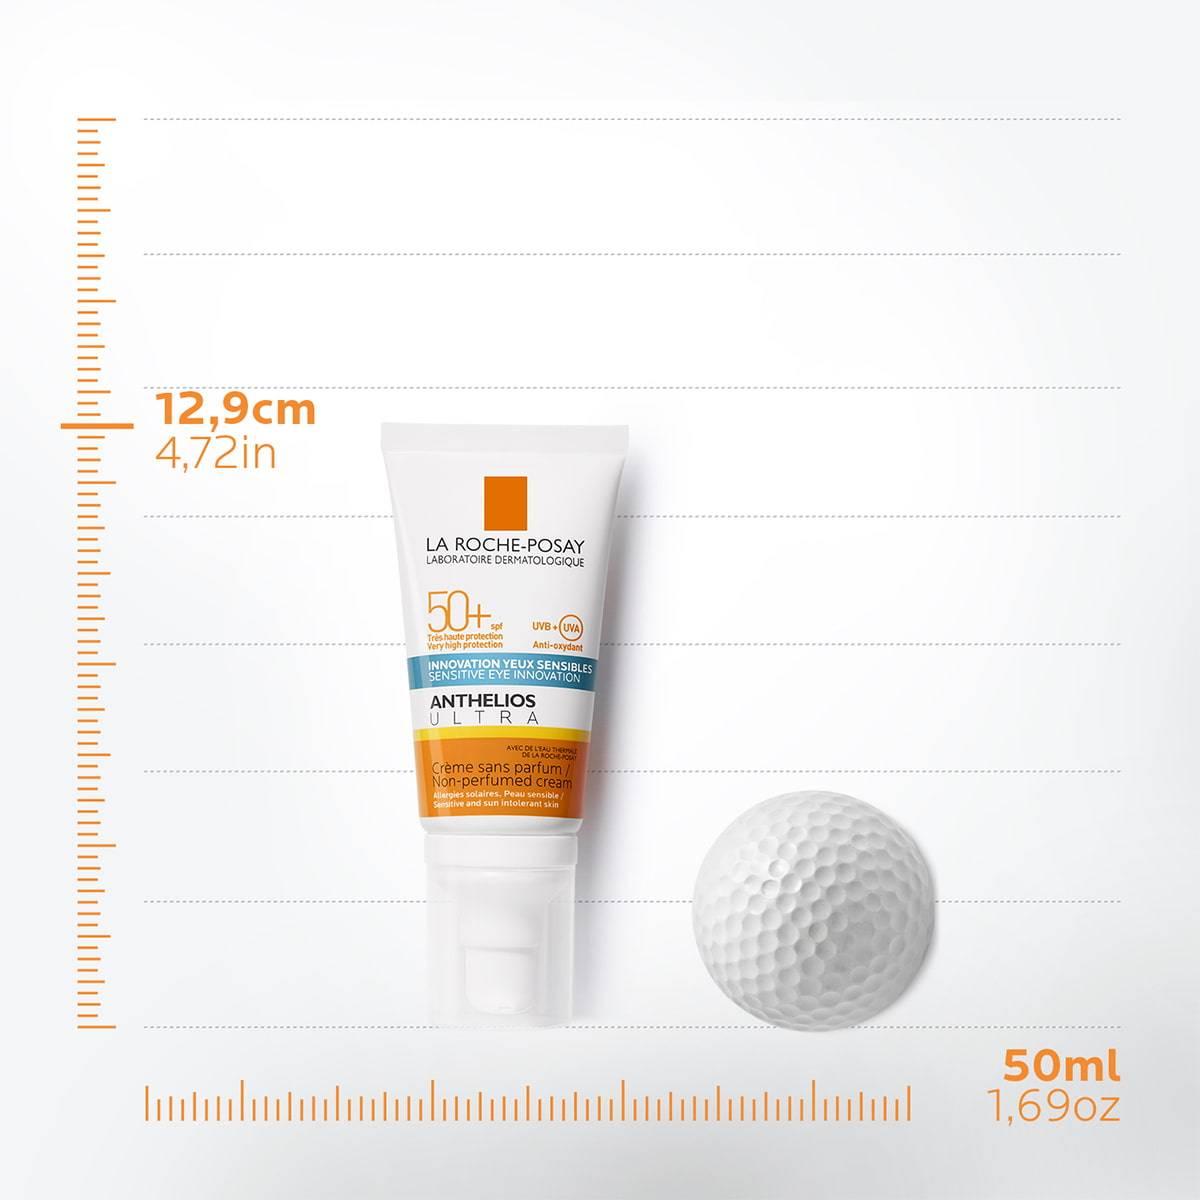 La Roche Posay Tuotesivu Aurinko Anthelios Ultra Face Spf50 50ml Fragran